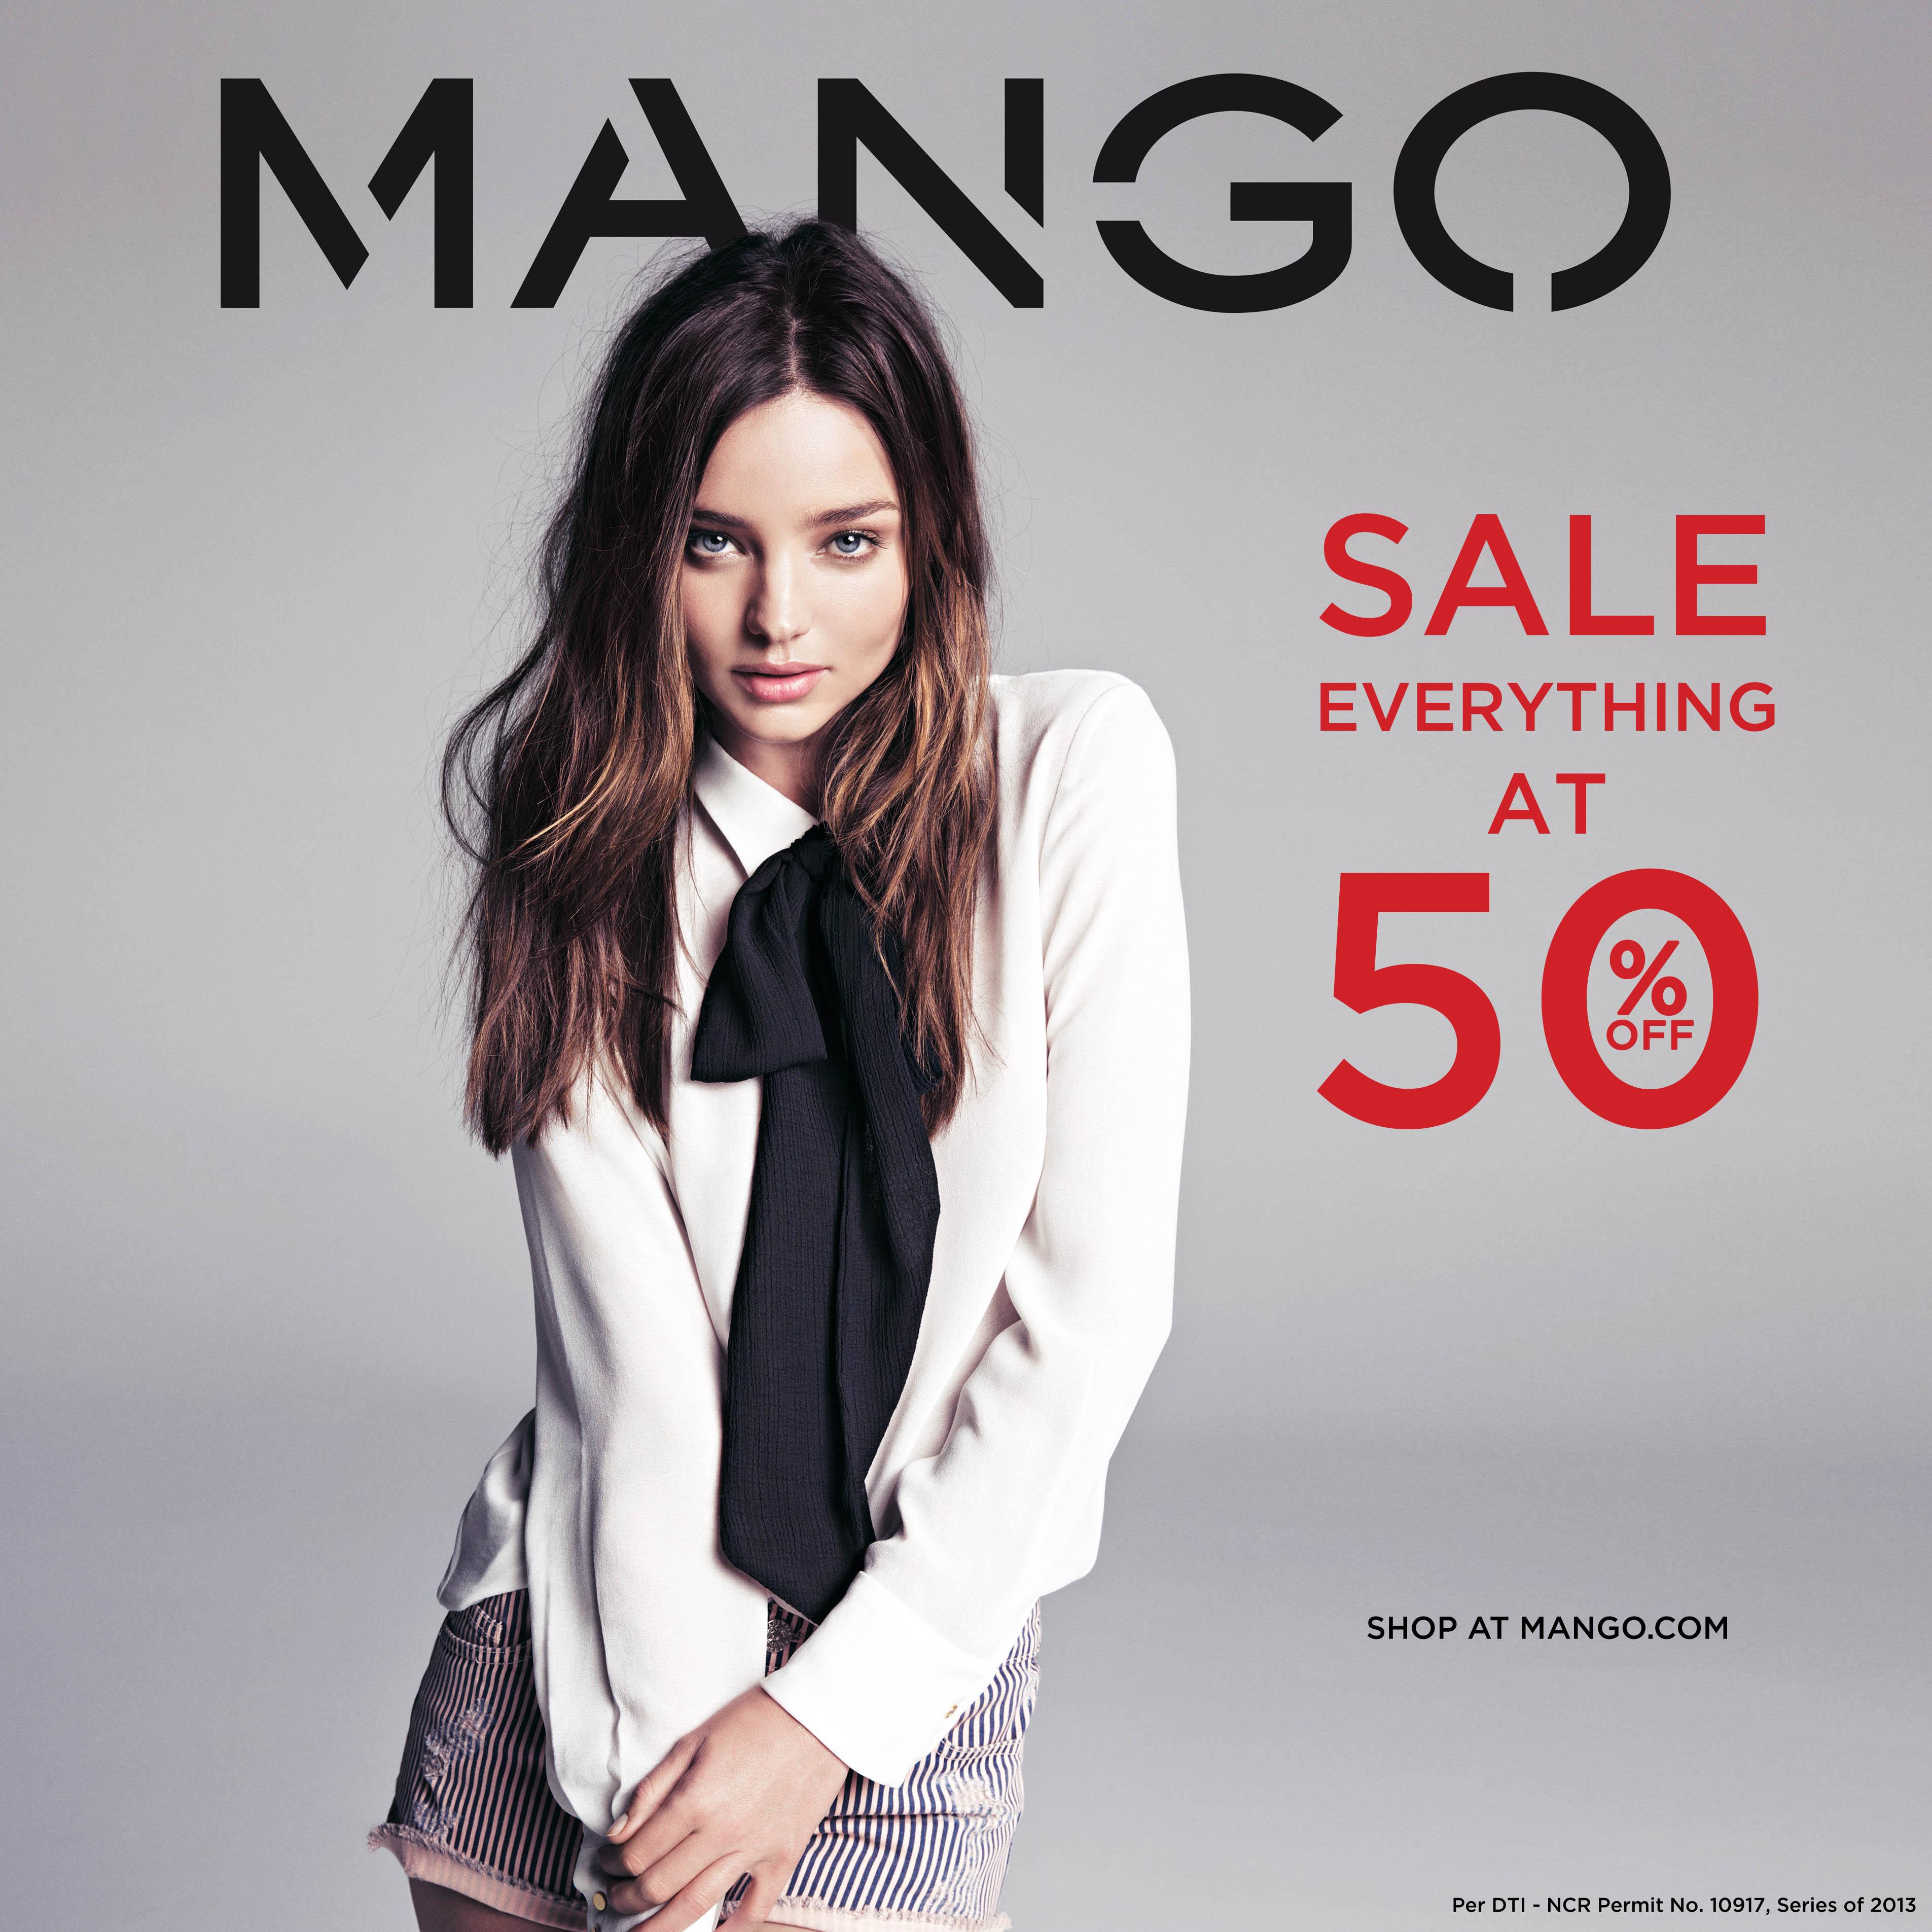 Mango, H.E. by Mango, & Mango Touch End of Season Sale December - January 2013